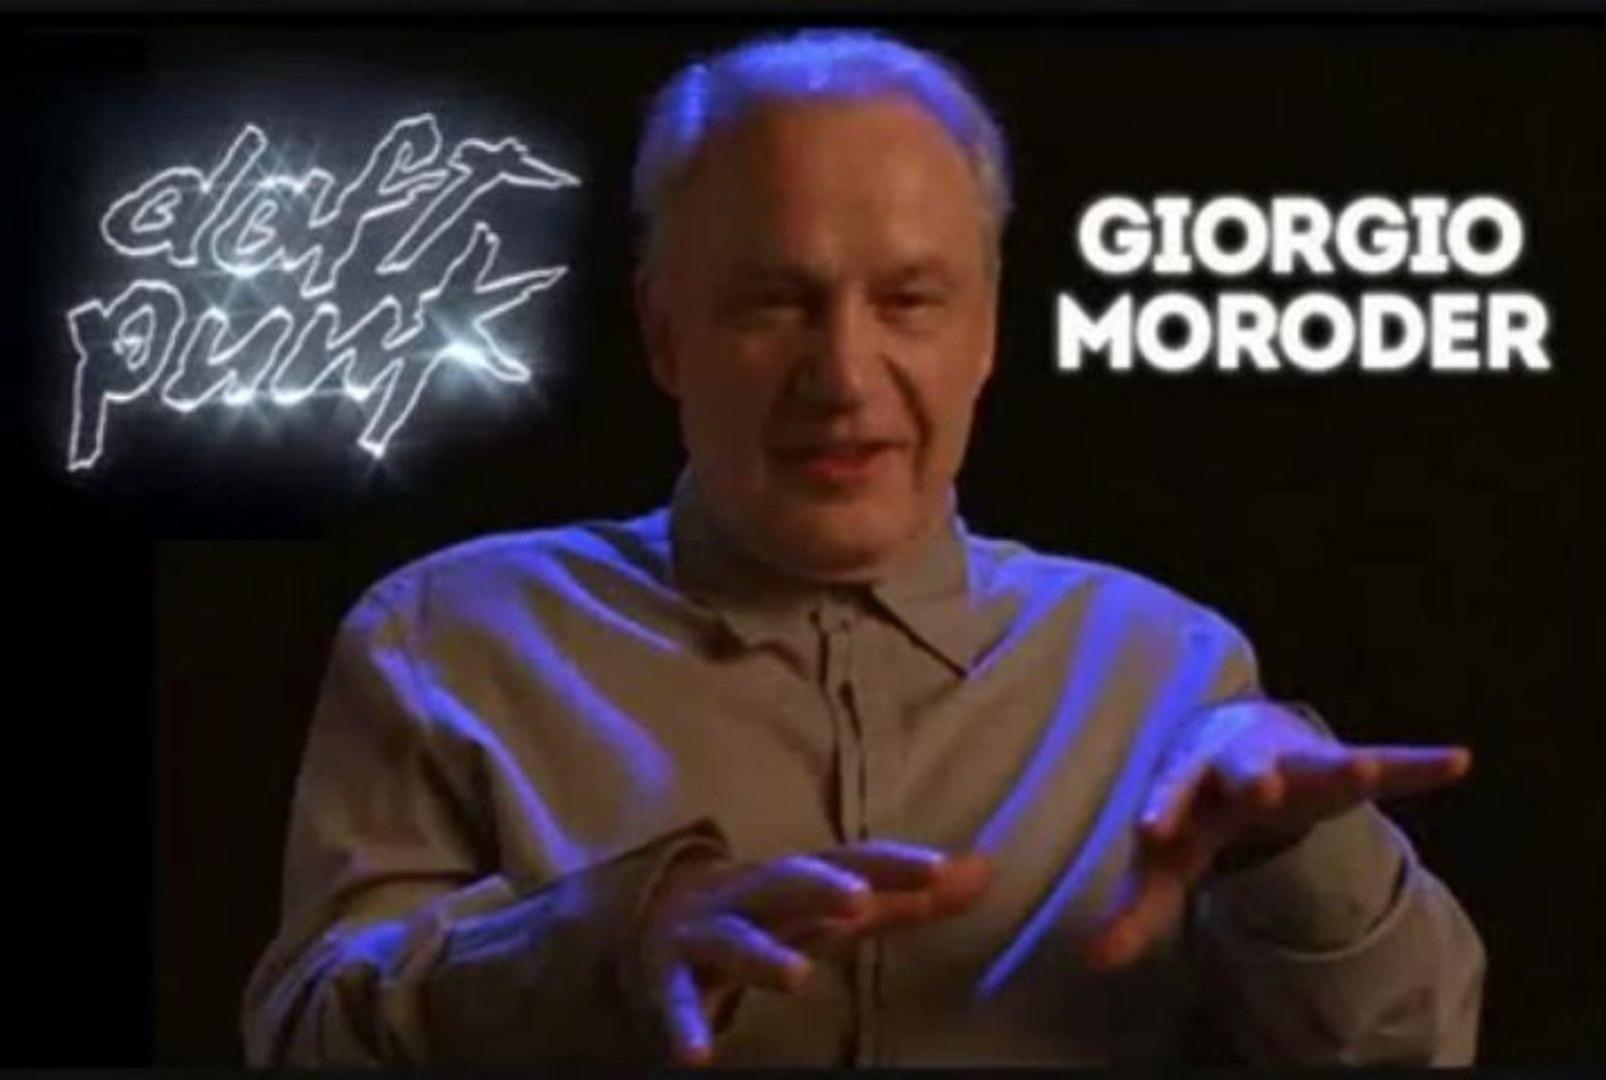 Daft Punk - Giorgio by Moroder (Edit Daftworld) - Vidéo Dailymotion